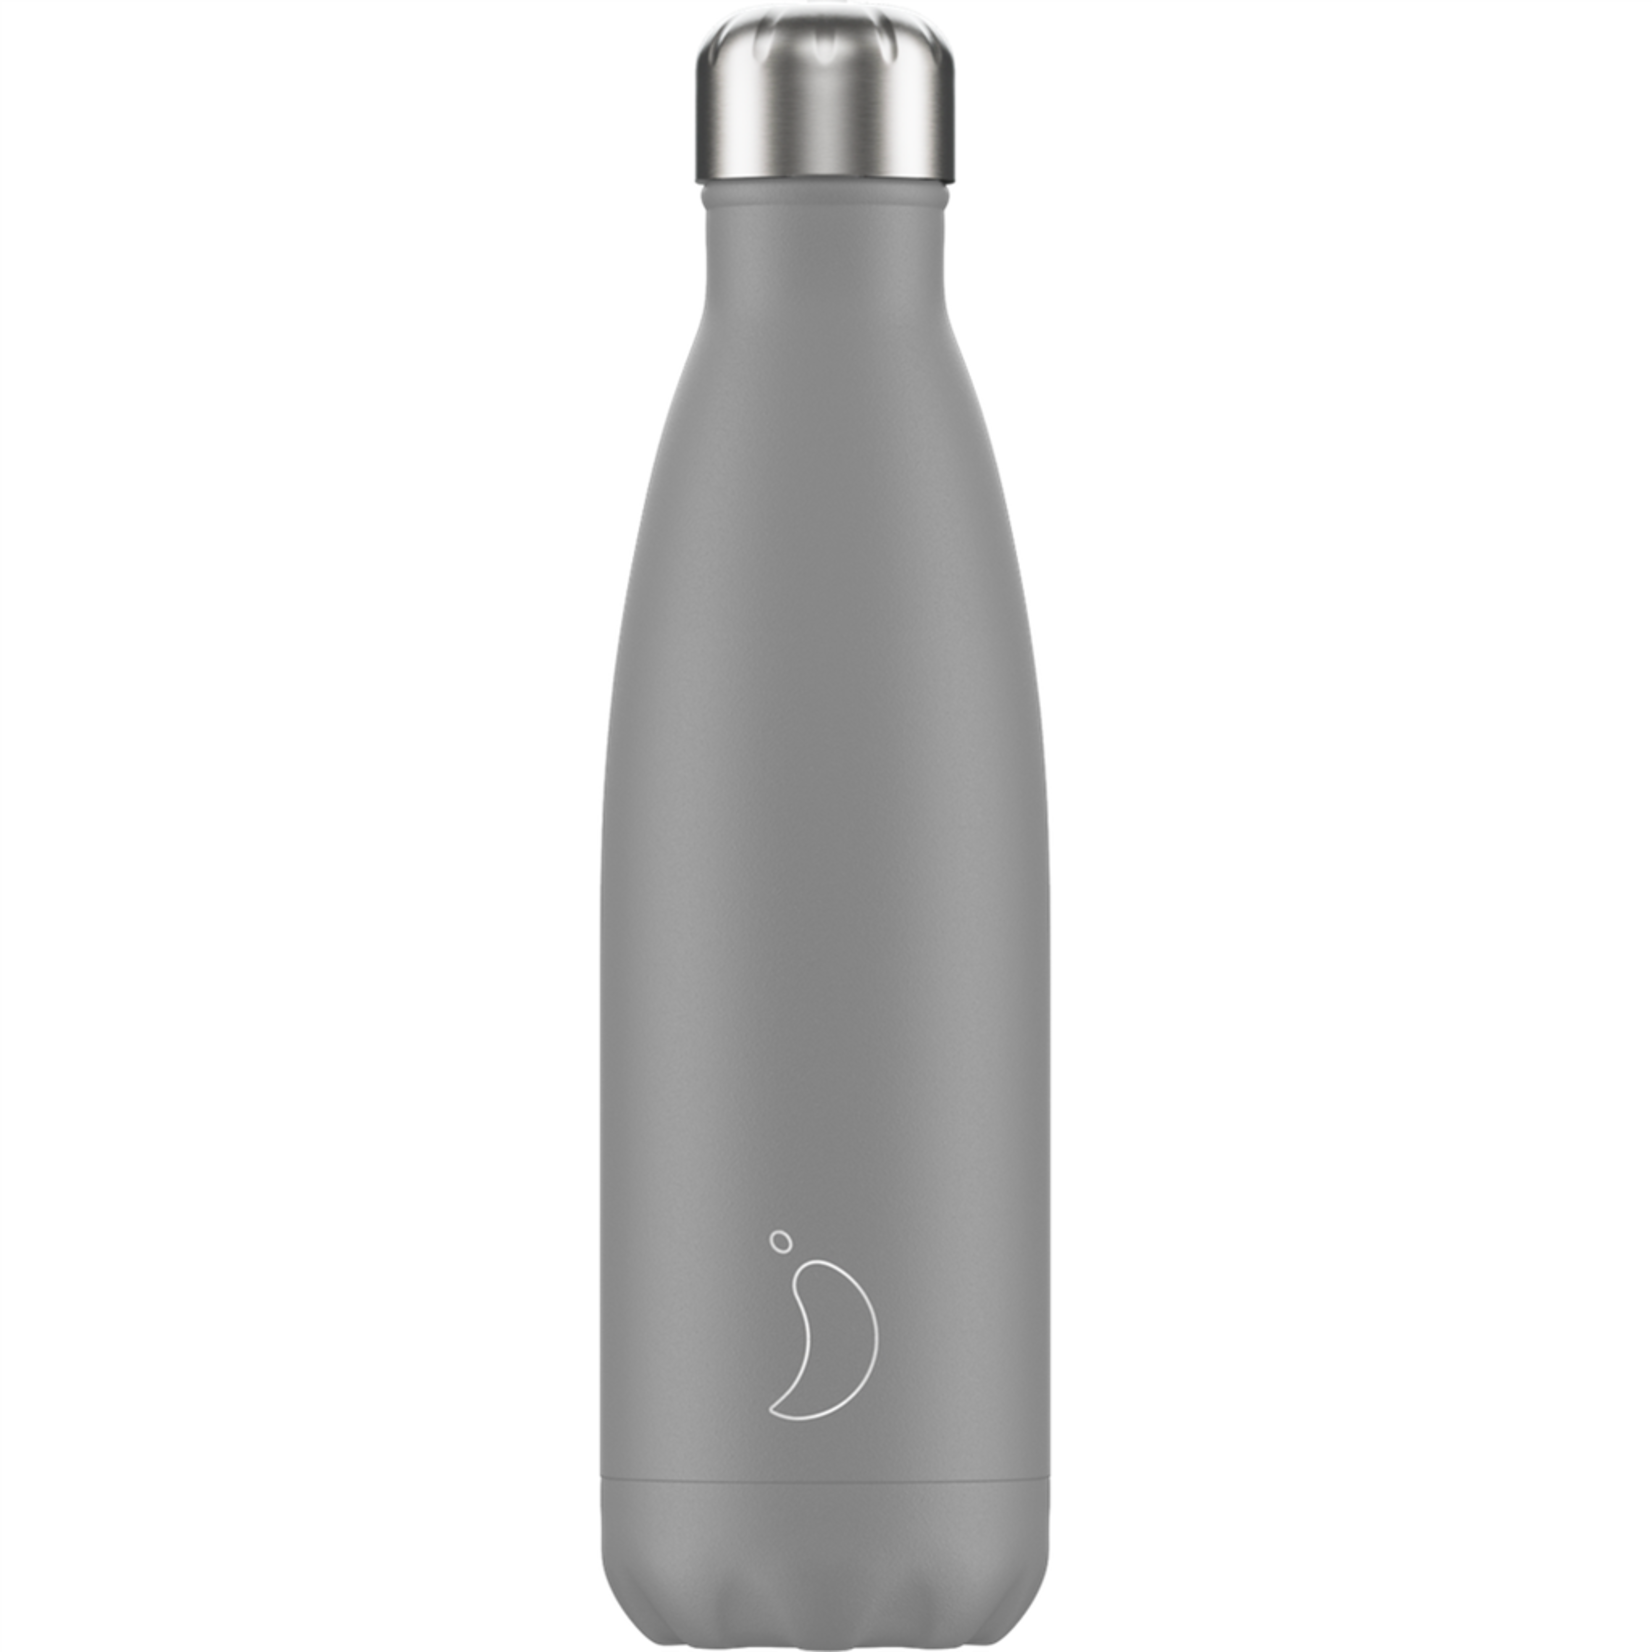 Chilly's Monochrome Grey - 750ml